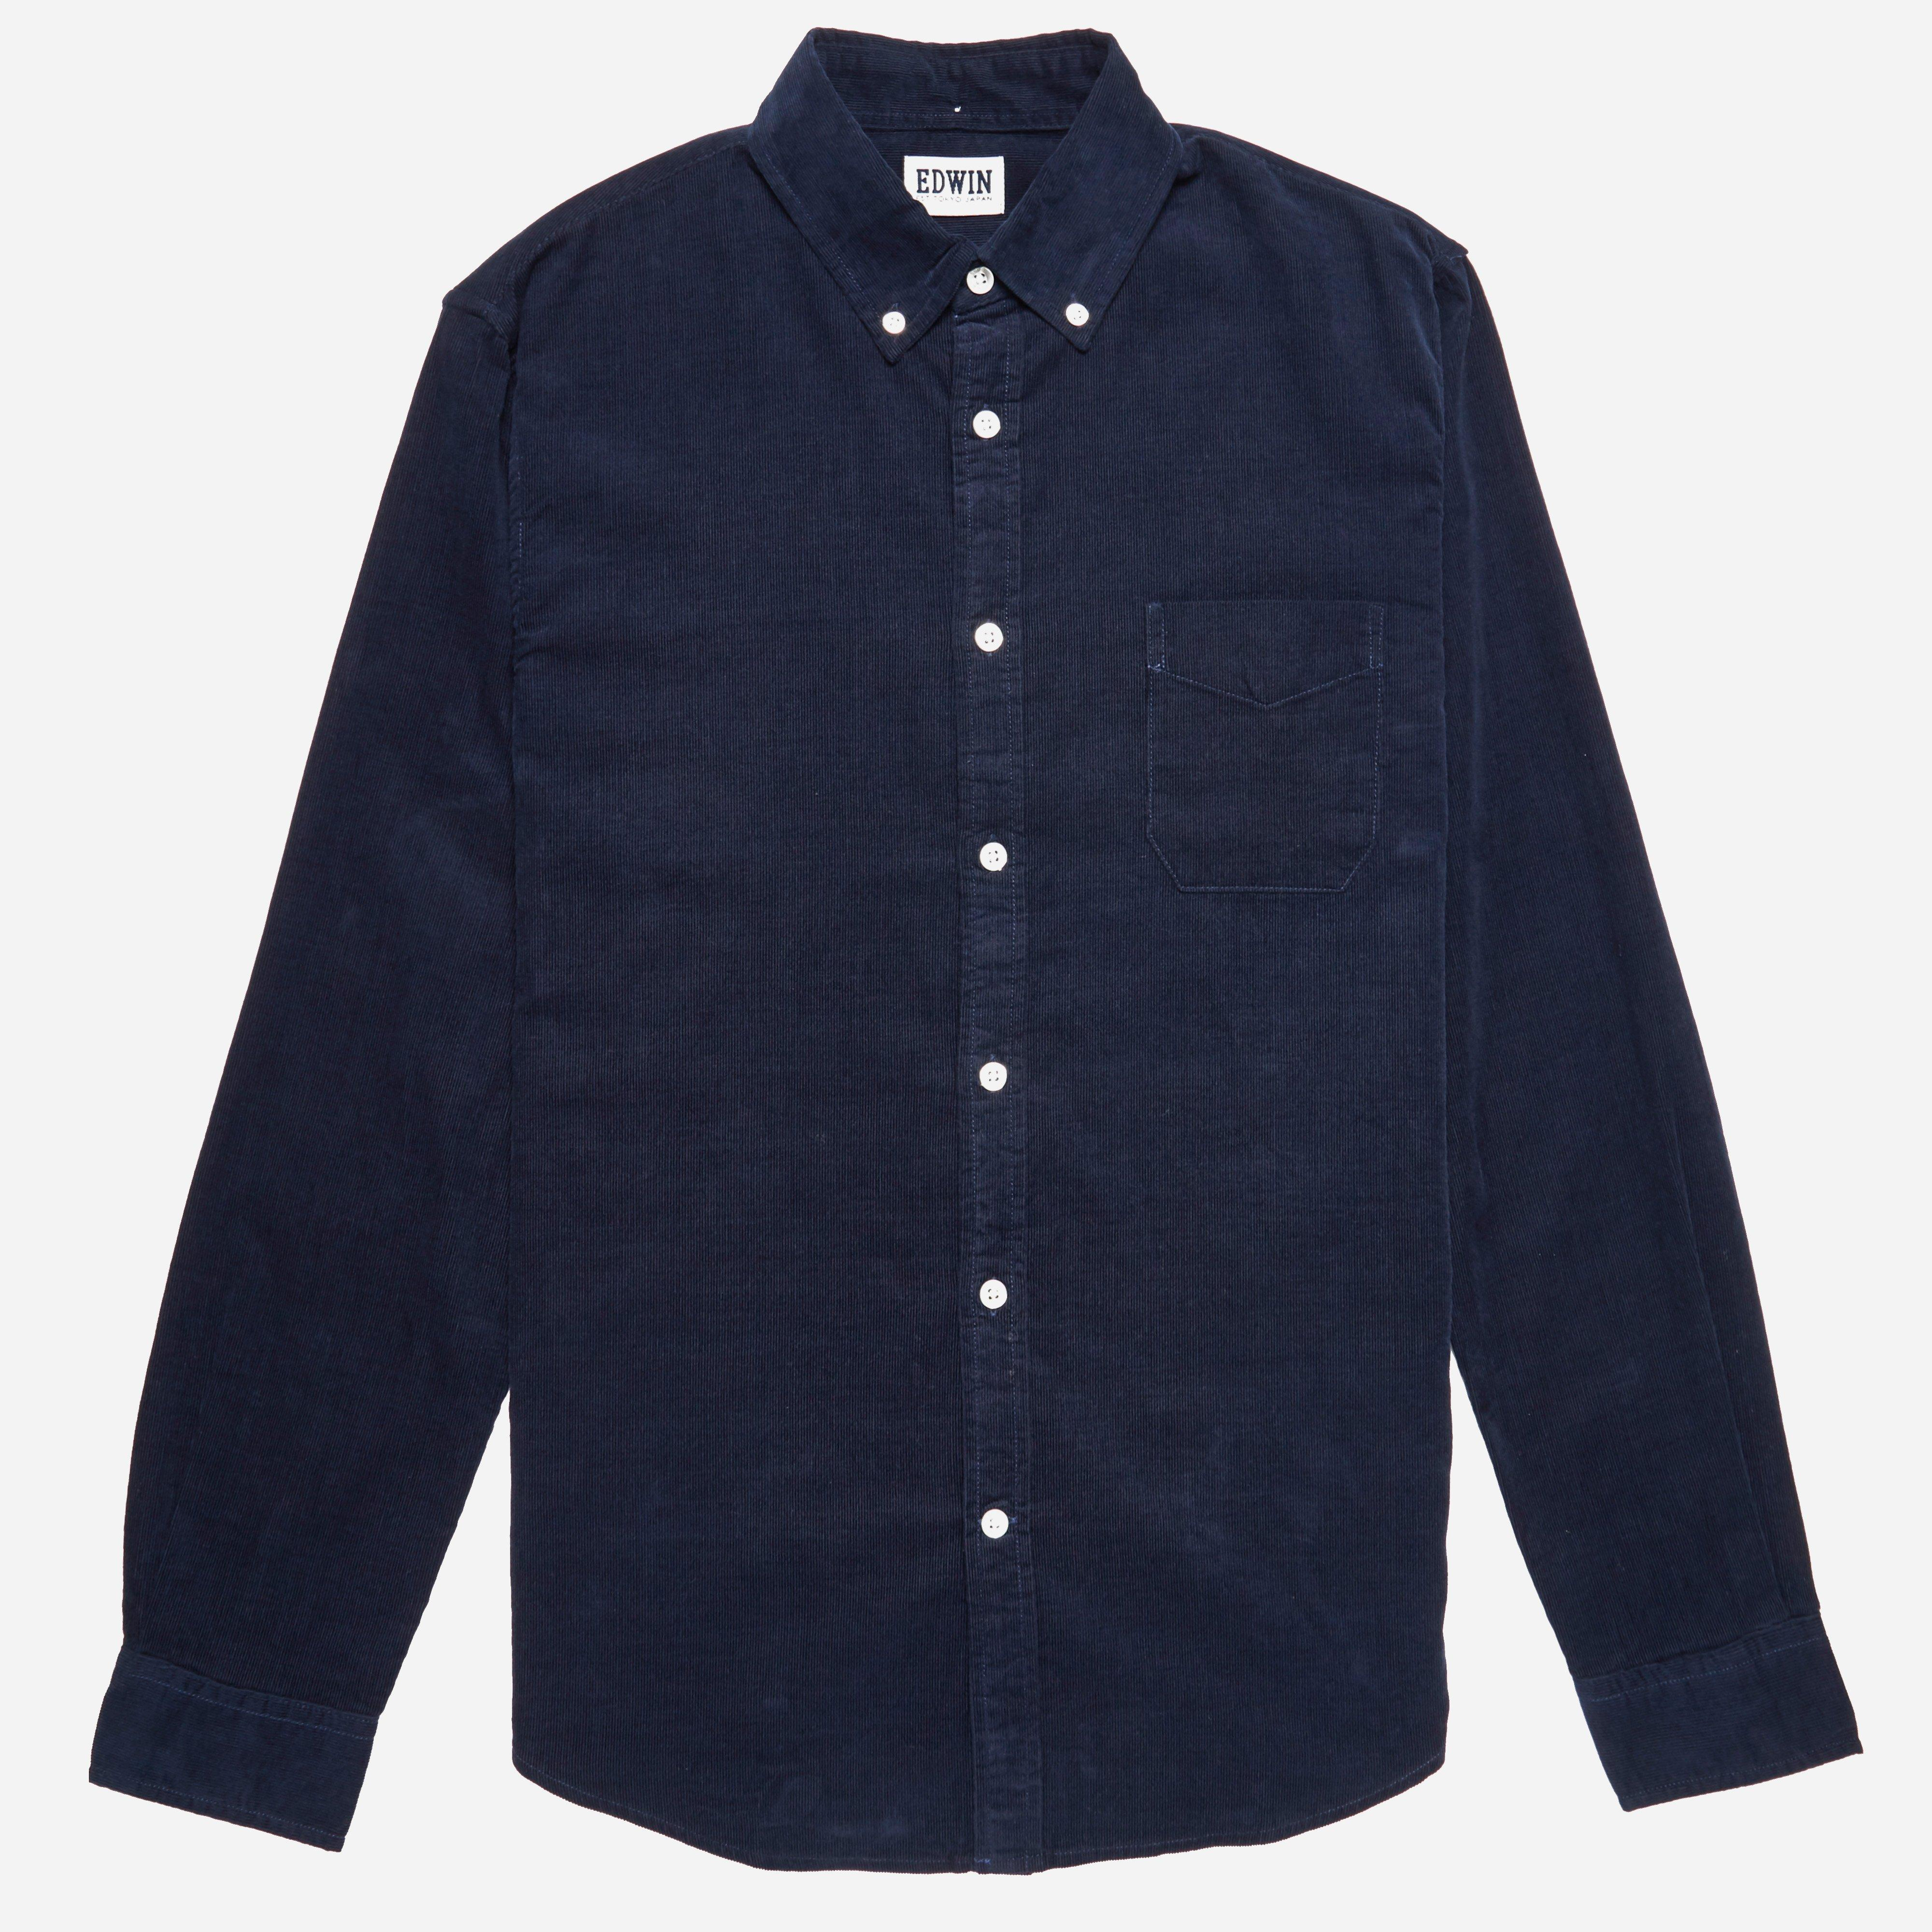 Edwin Babycord Standard Shirt